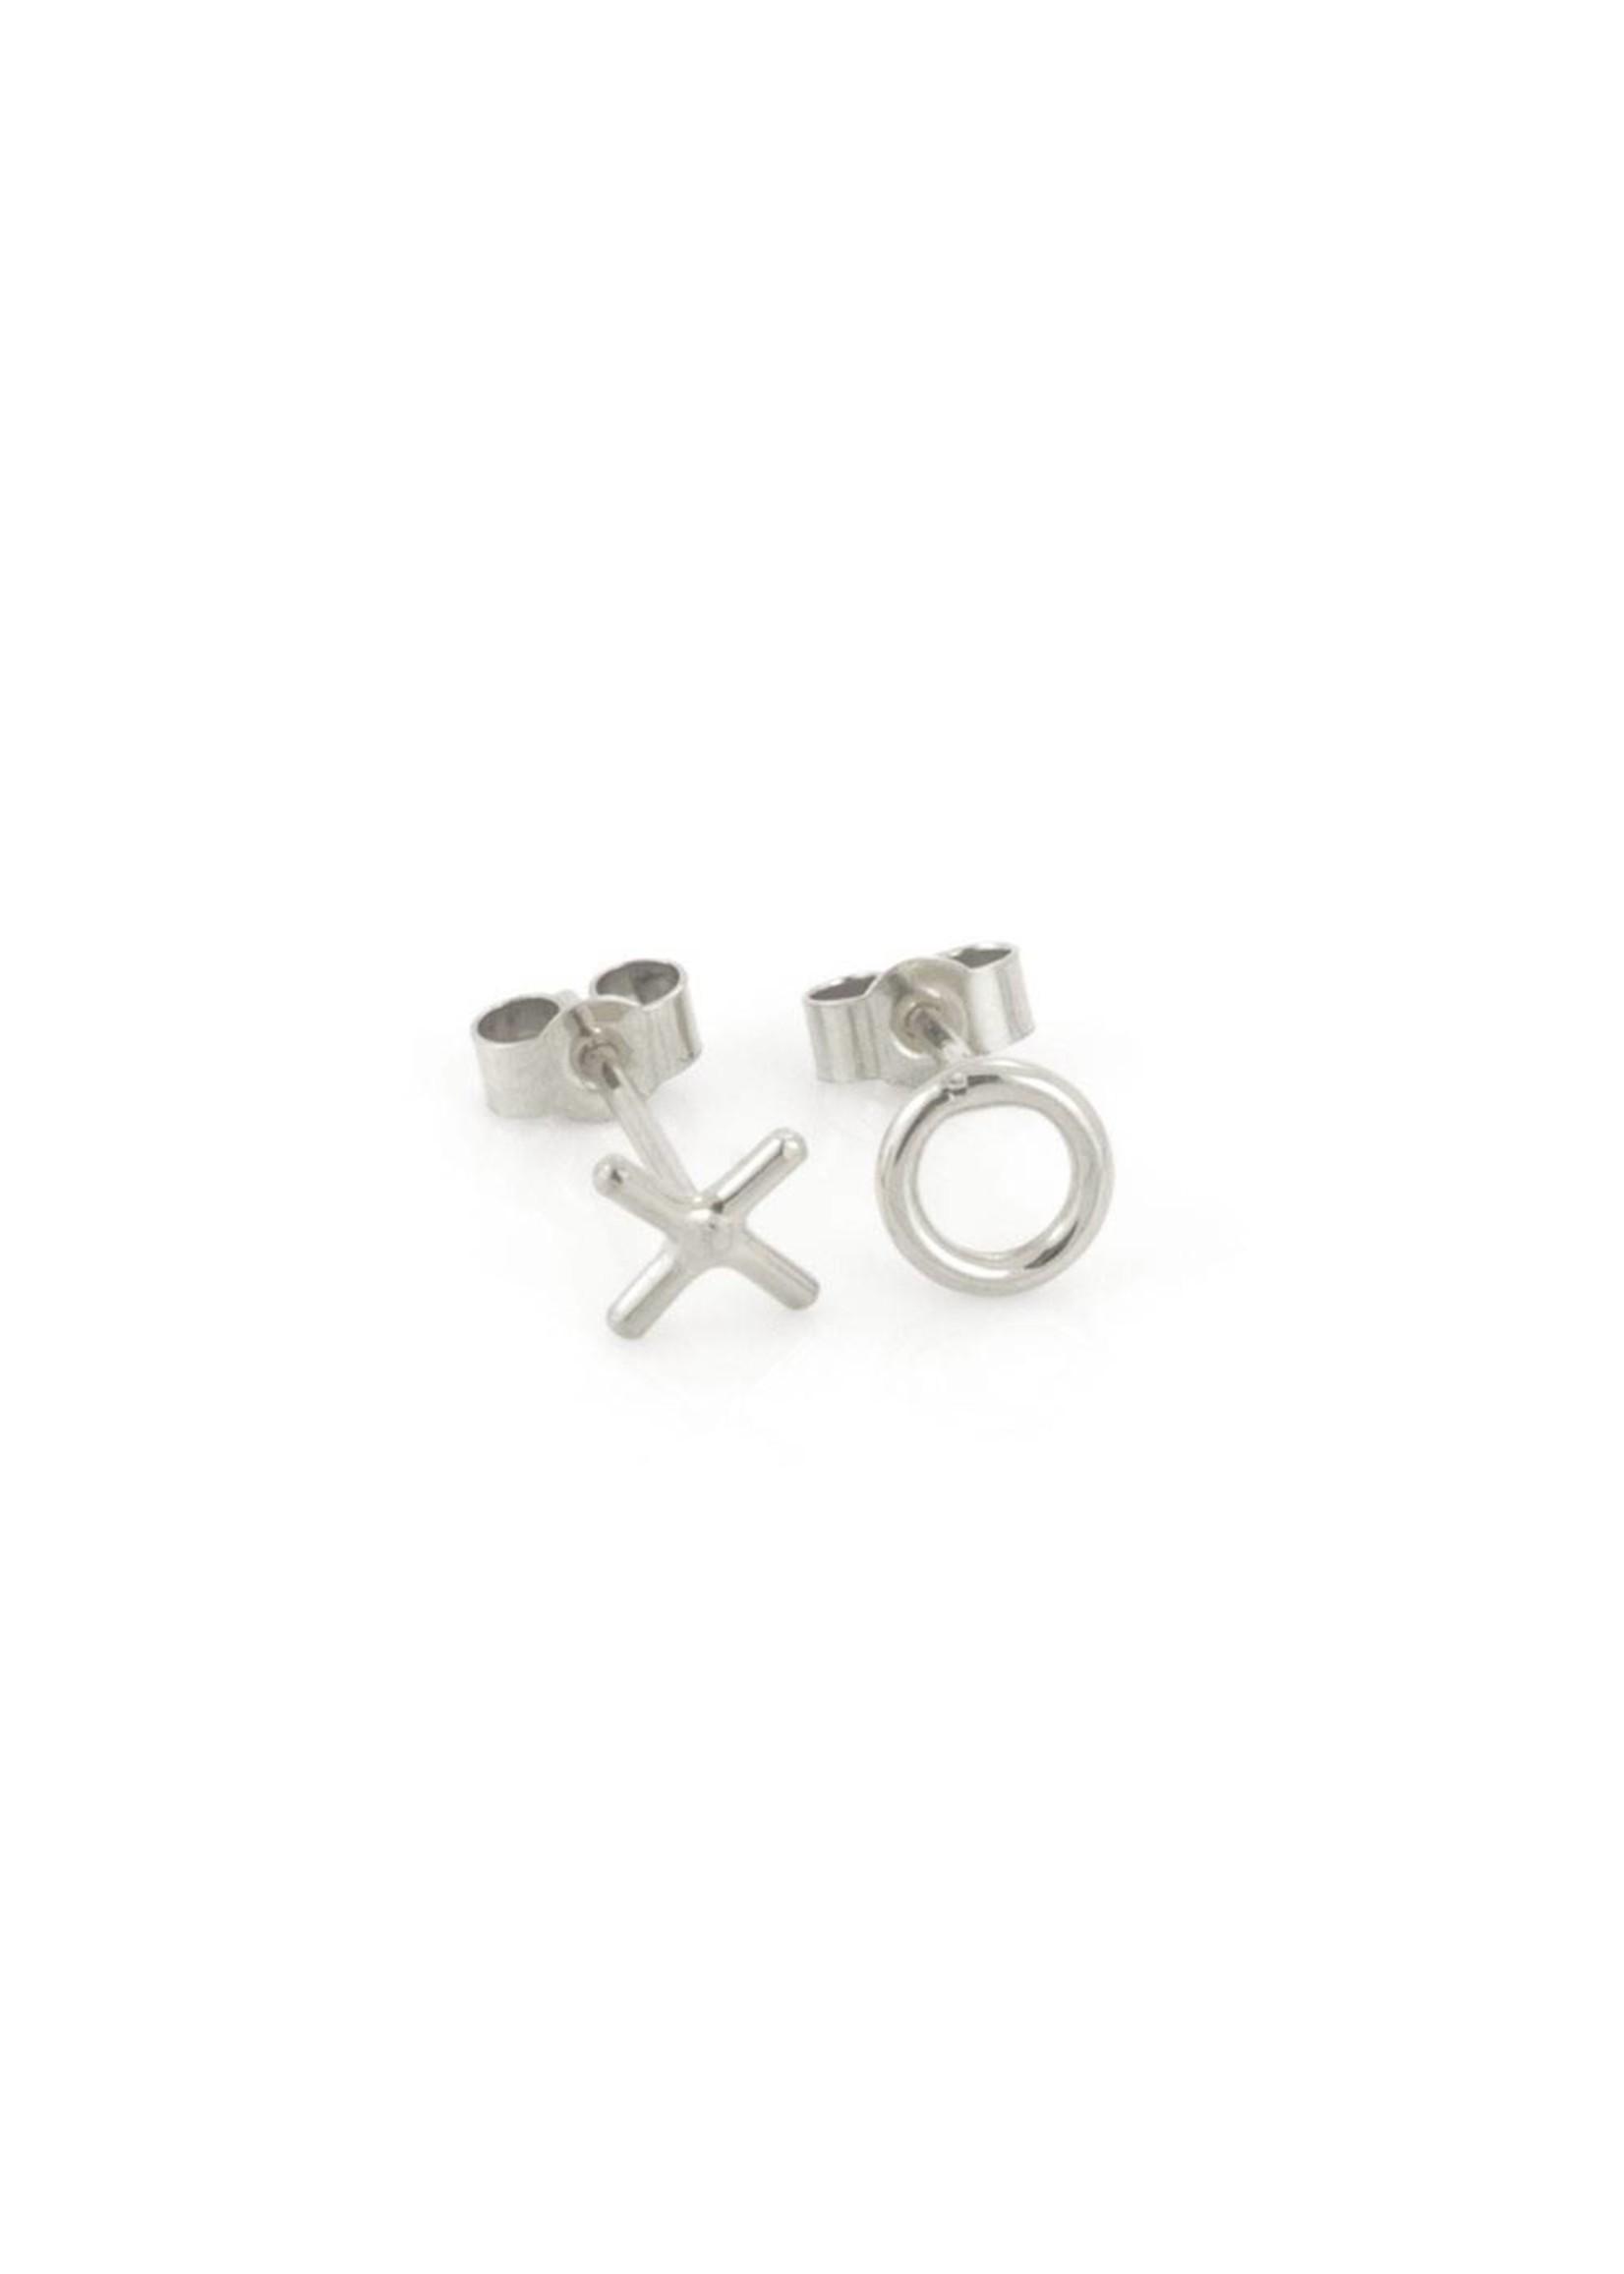 Laura Gravestock Laura Gravestock Written X O Stud Earring - Silver